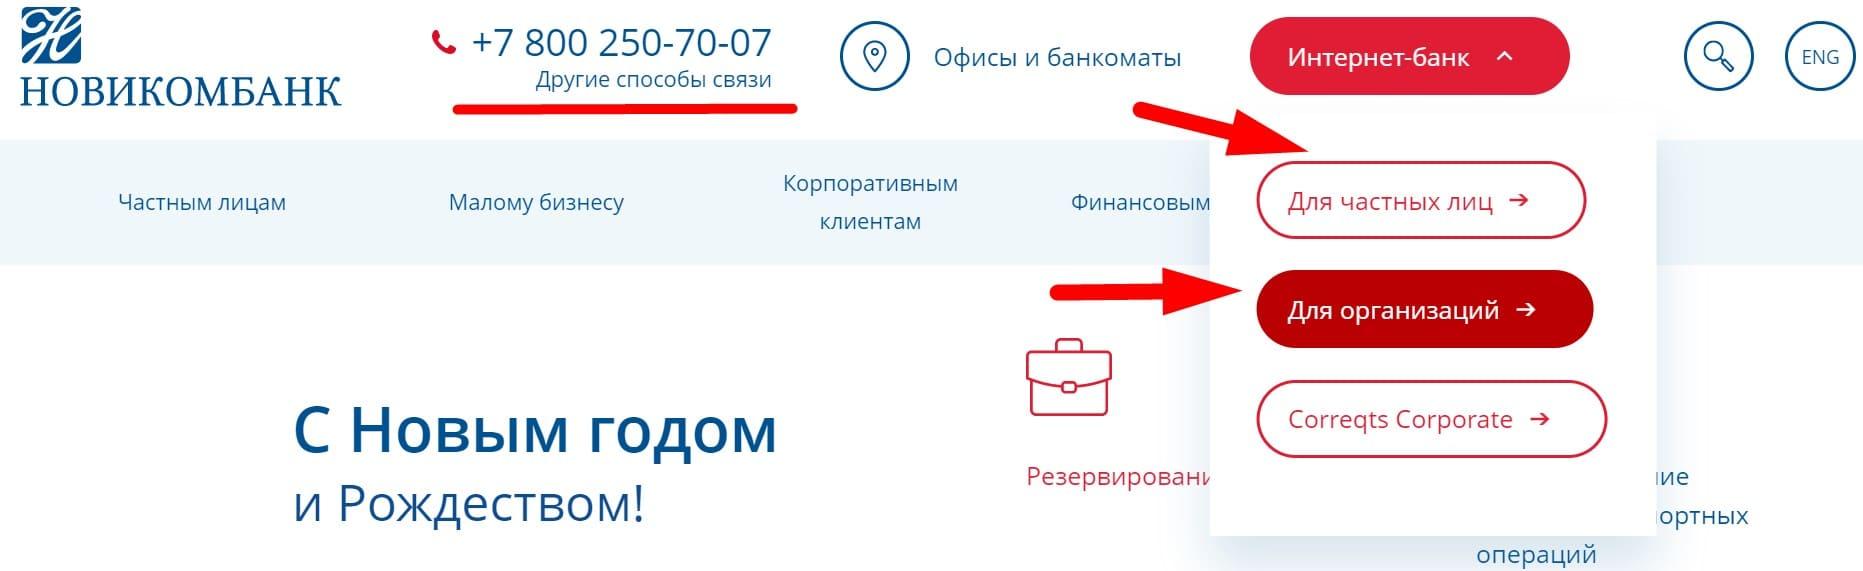 Новикомбанк сайт